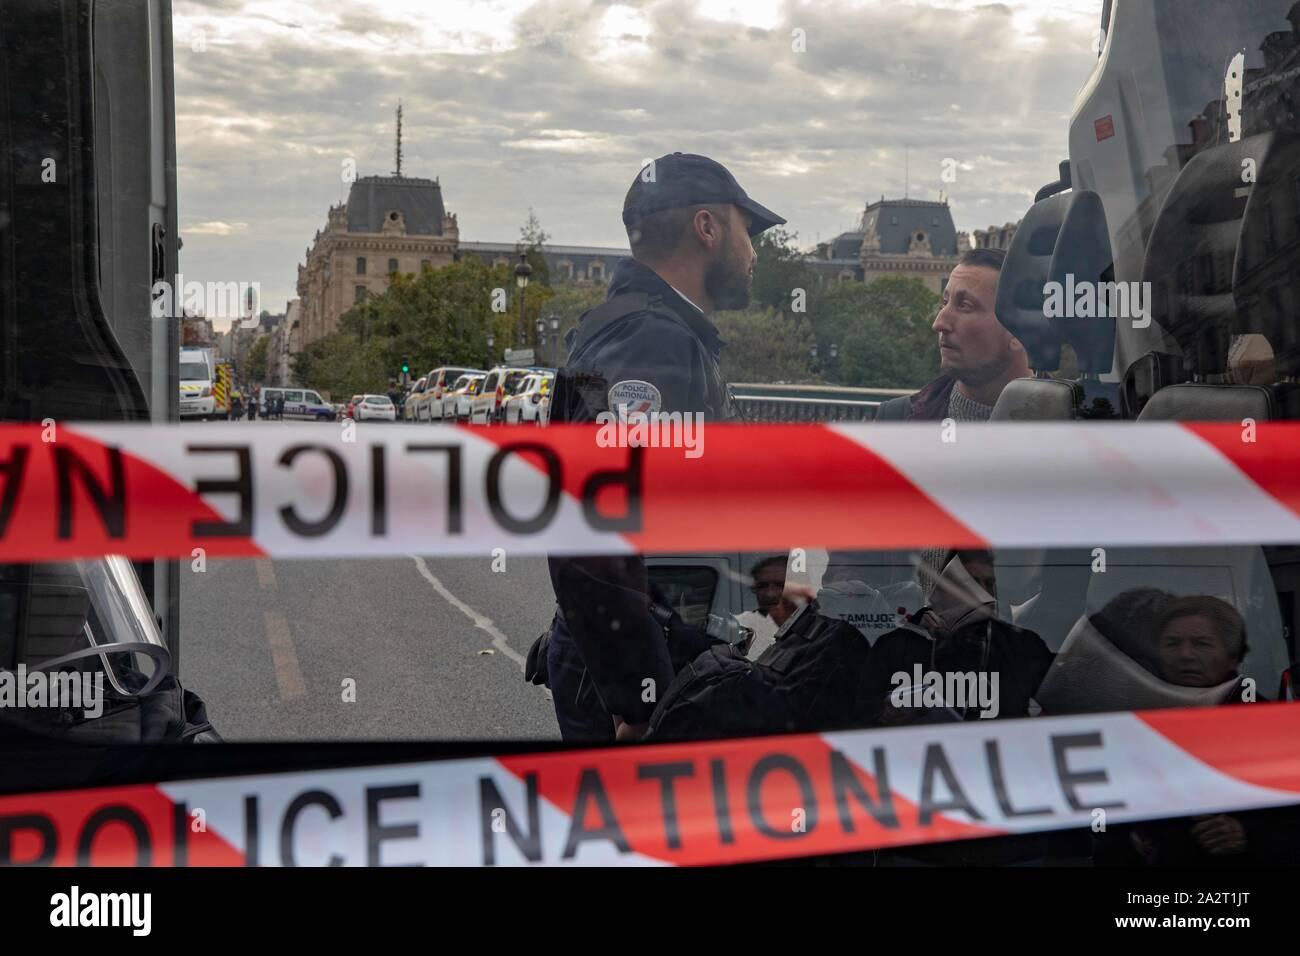 Paris, France. 3rd October 2019. Police Headquarter attacked Credit: EDOUARD MONFRAIS/Alamy Live News Stock Photo